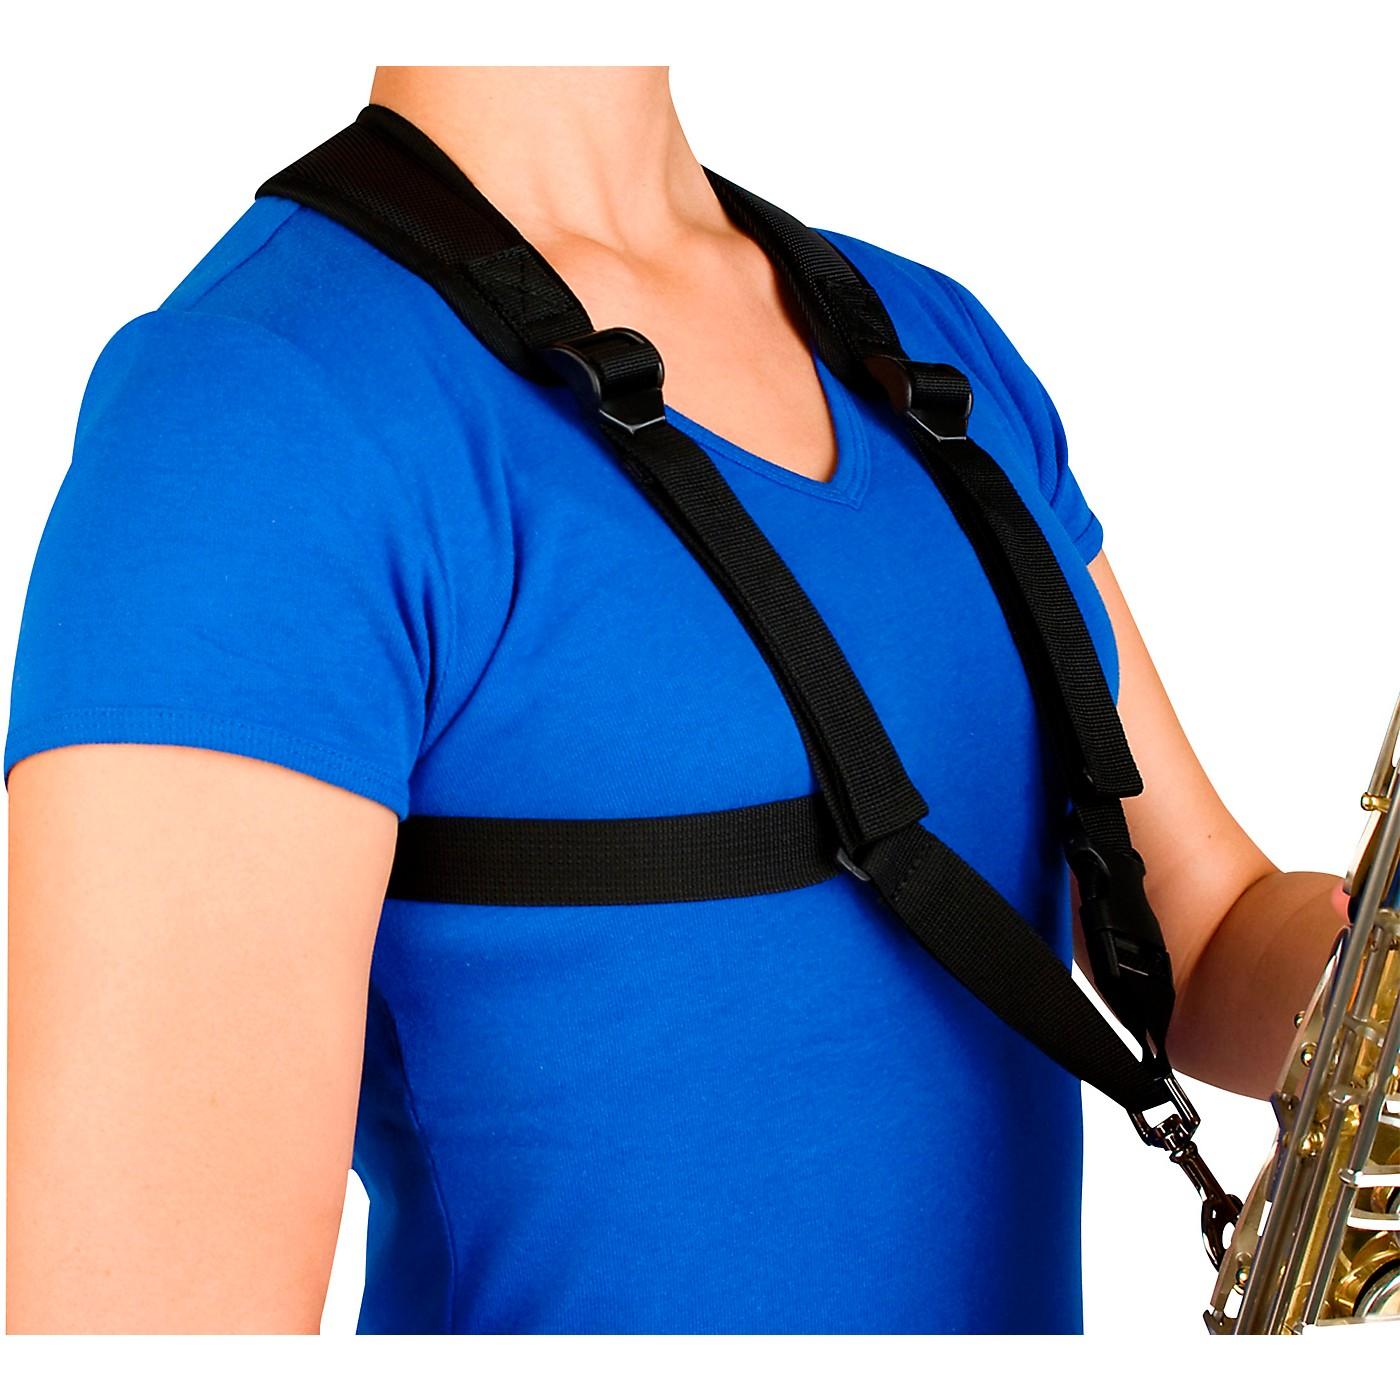 Protec Smaller Padded Harness For Alto / Tenor / Baritone Saxophone thumbnail